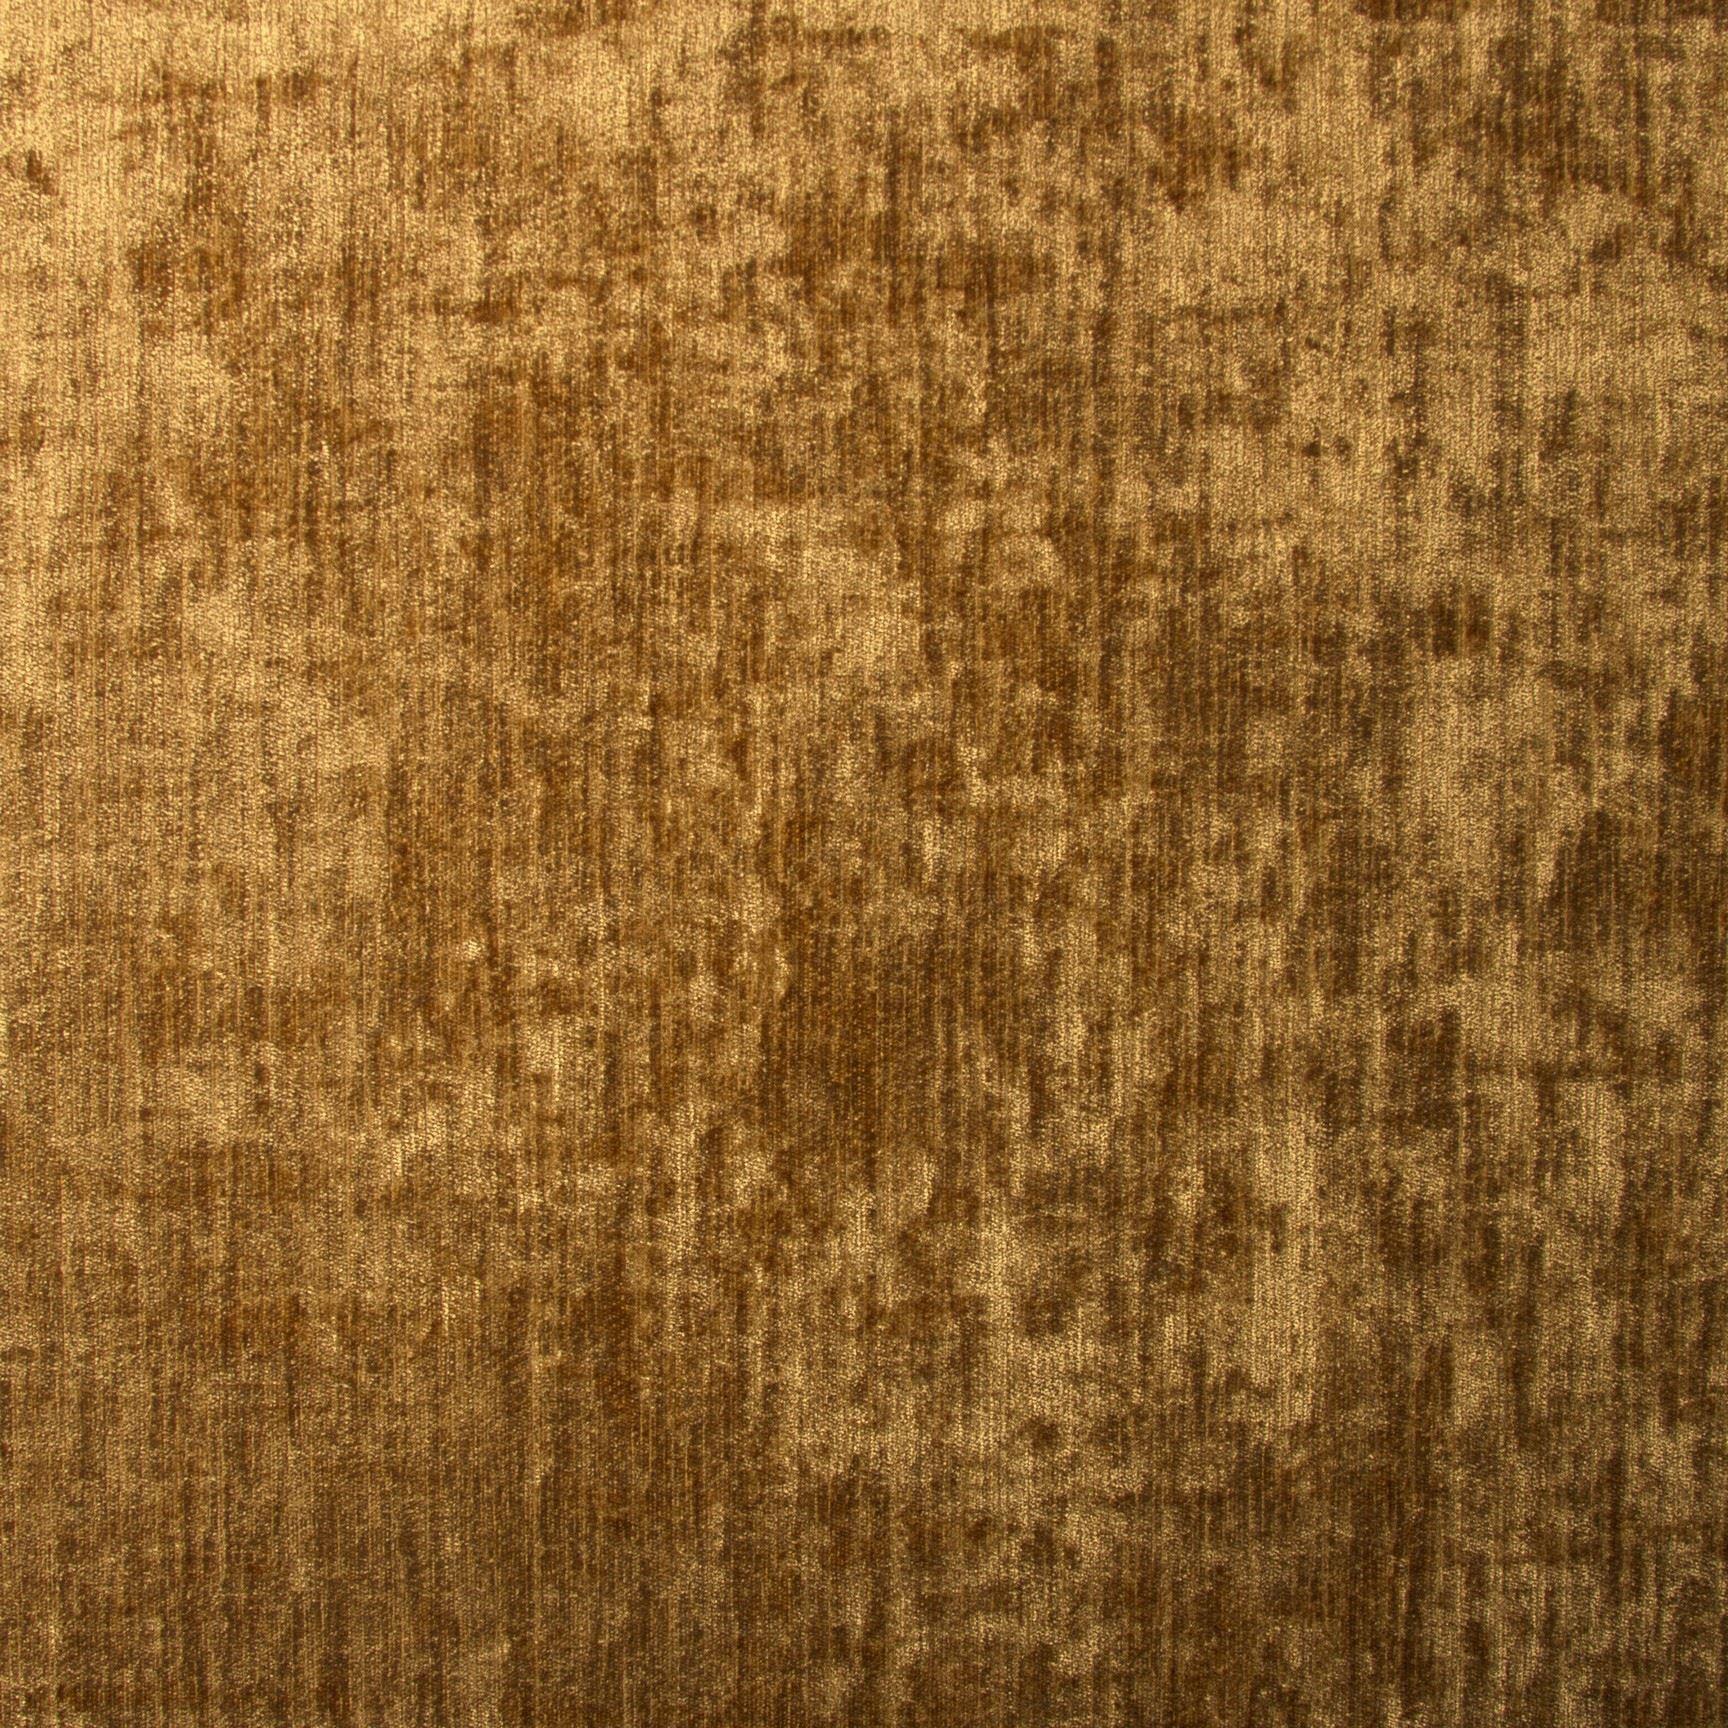 LUXURY PLUSH CRUSHED SATIN VELVET SUPER SOFT HEAVY WEIGHT UPHOLSTERY FABRIC